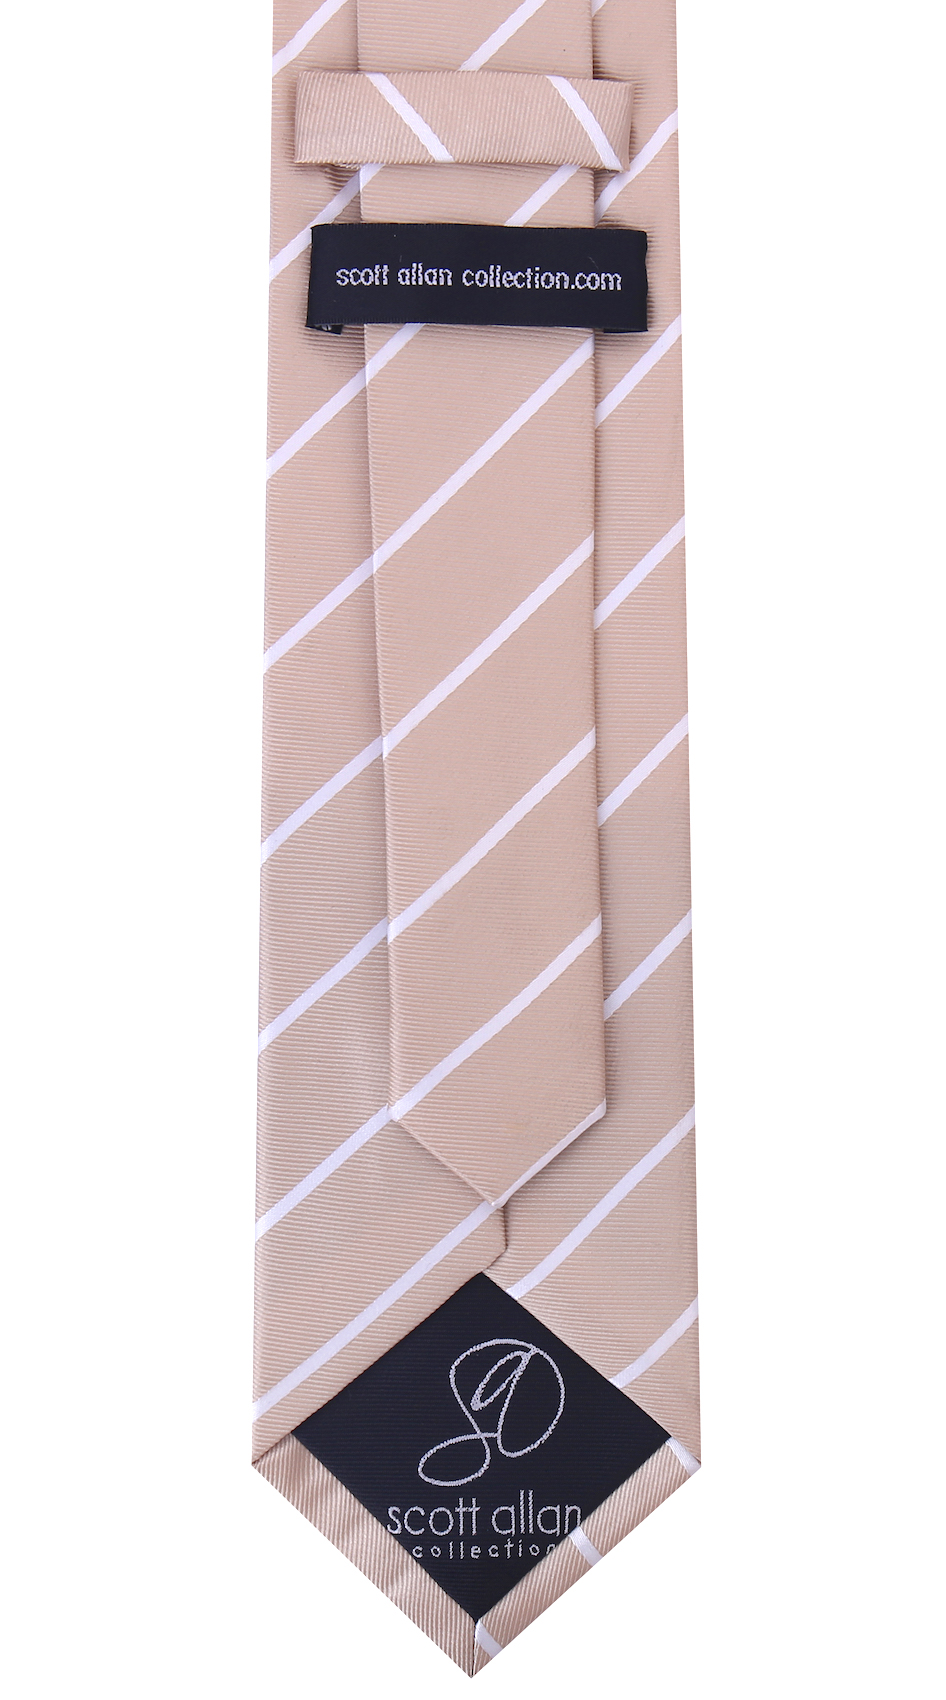 Scott-Allan-Mens-Necktie-Pencil-Striped-Mens-Tie thumbnail 8